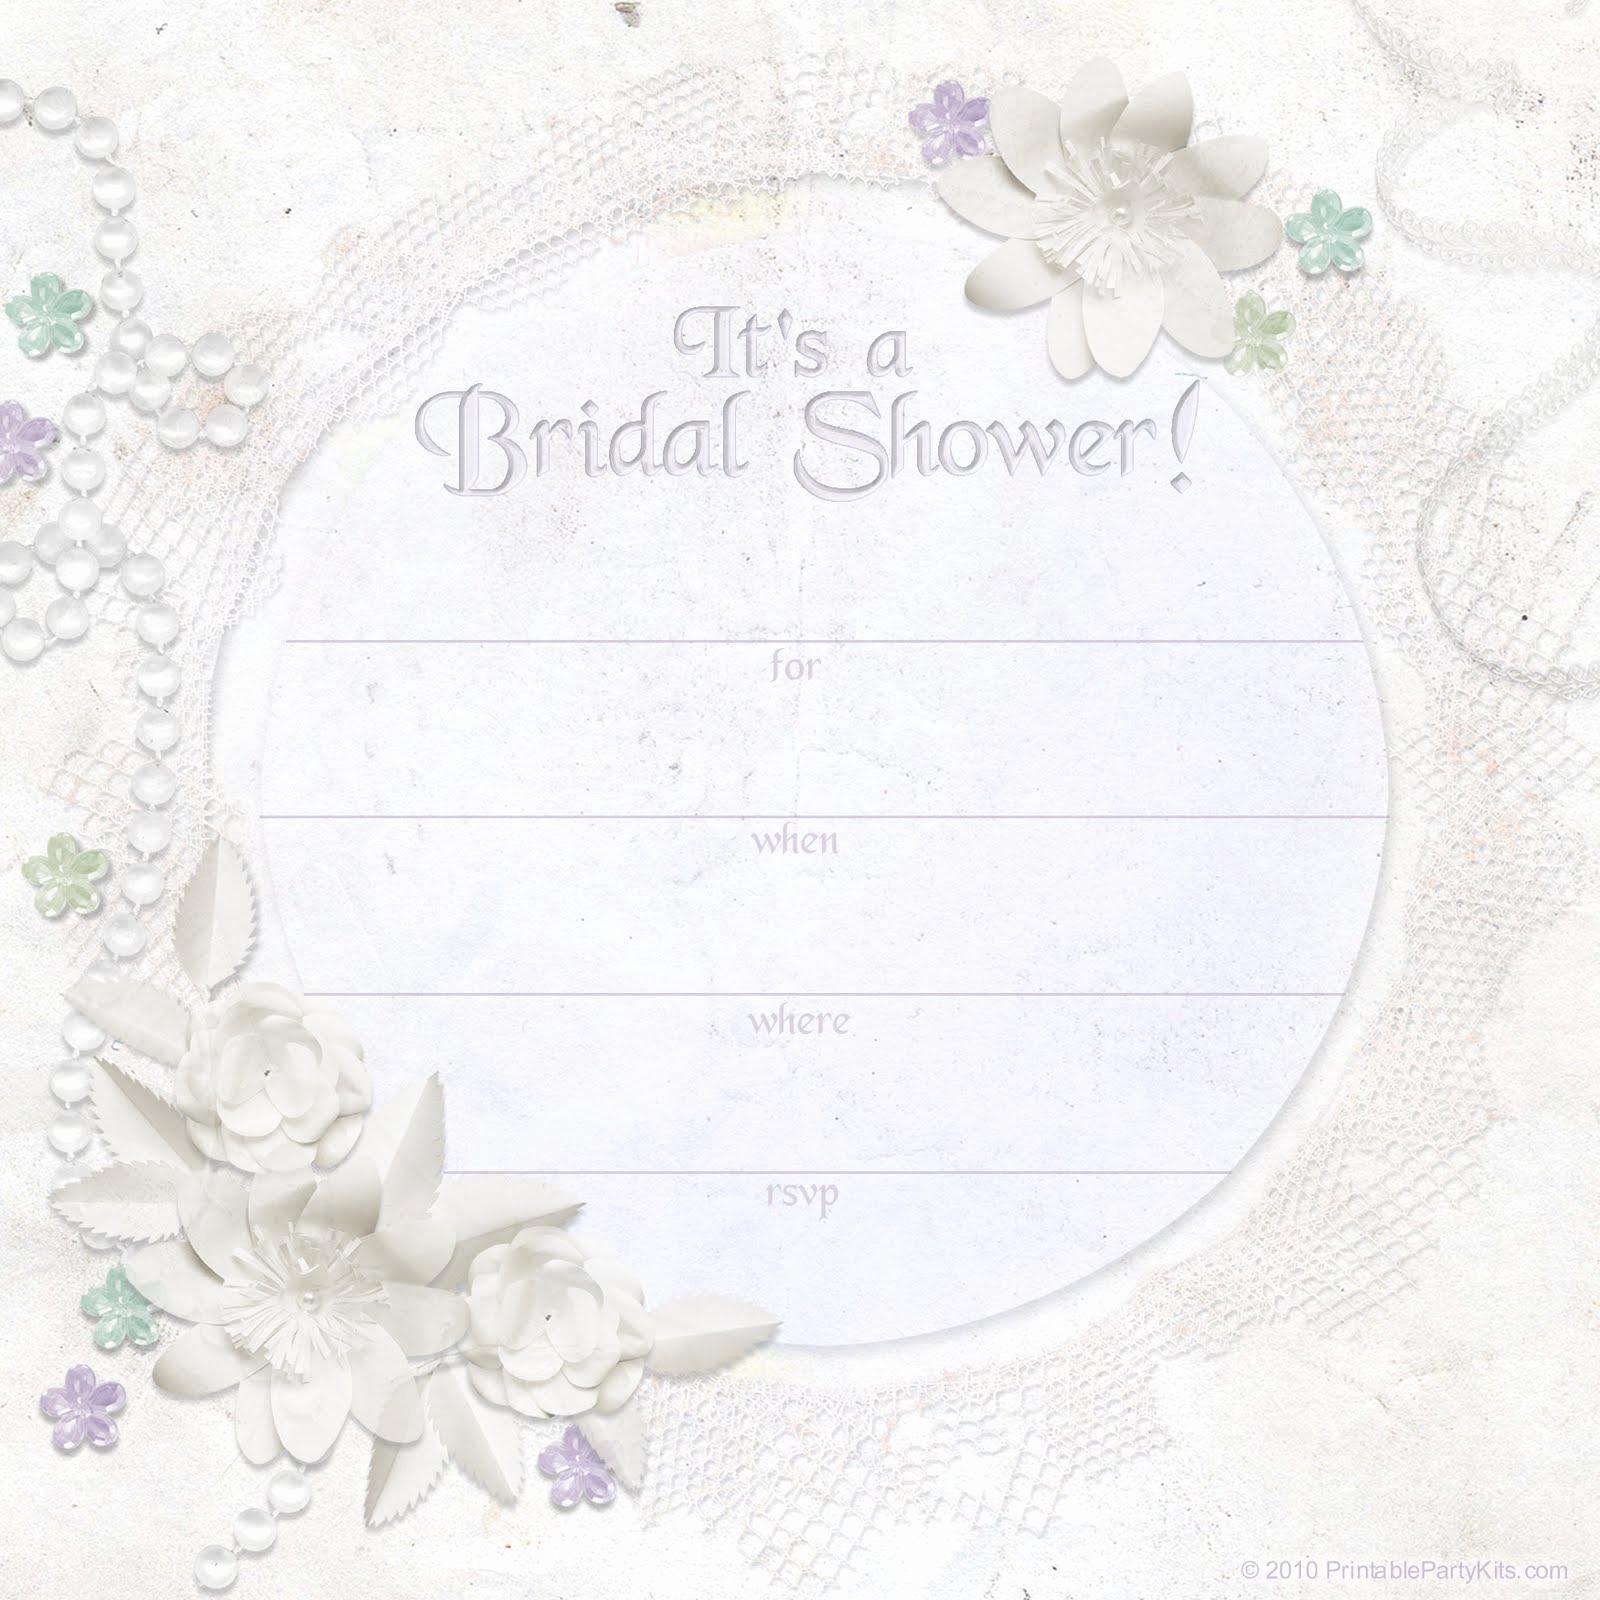 Free Printable Bridal Shower Invitations Luxury Free Printable Party Invitations Ivory Dreams Bridal